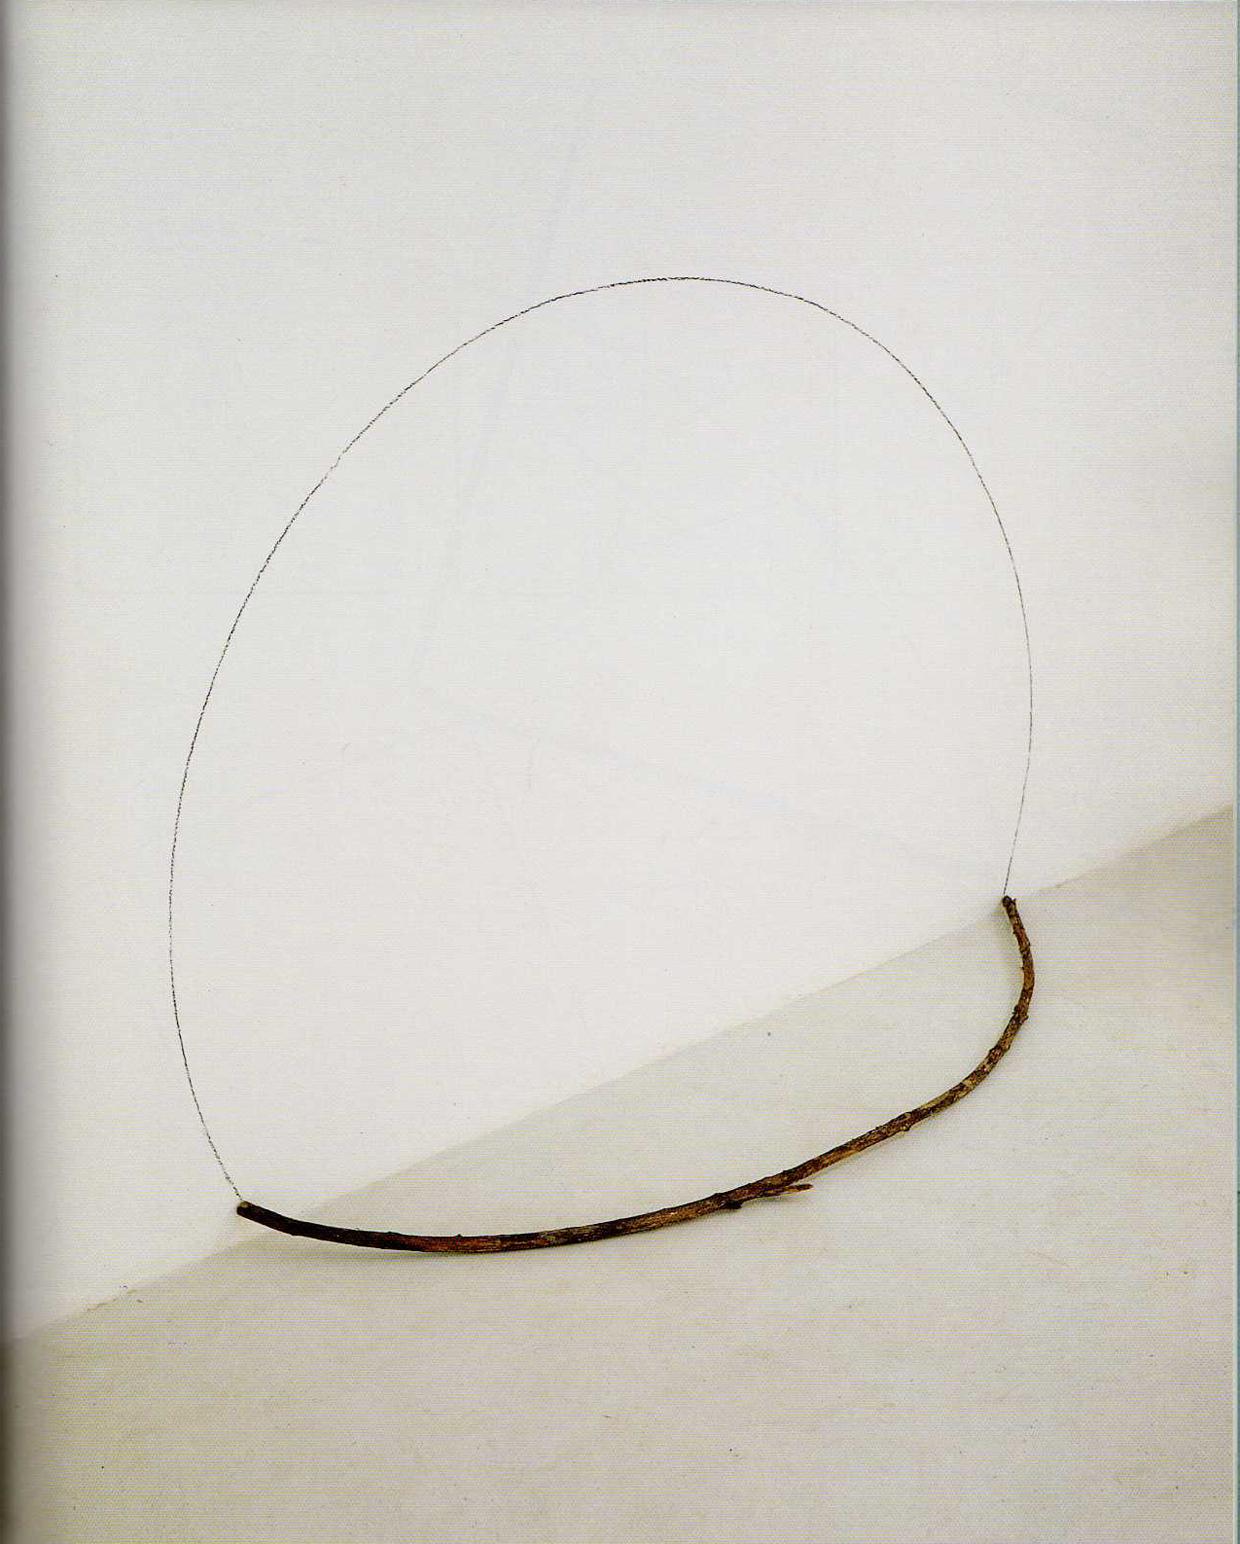 arcs-de-cercle-complementaires_geometree-n5_1983